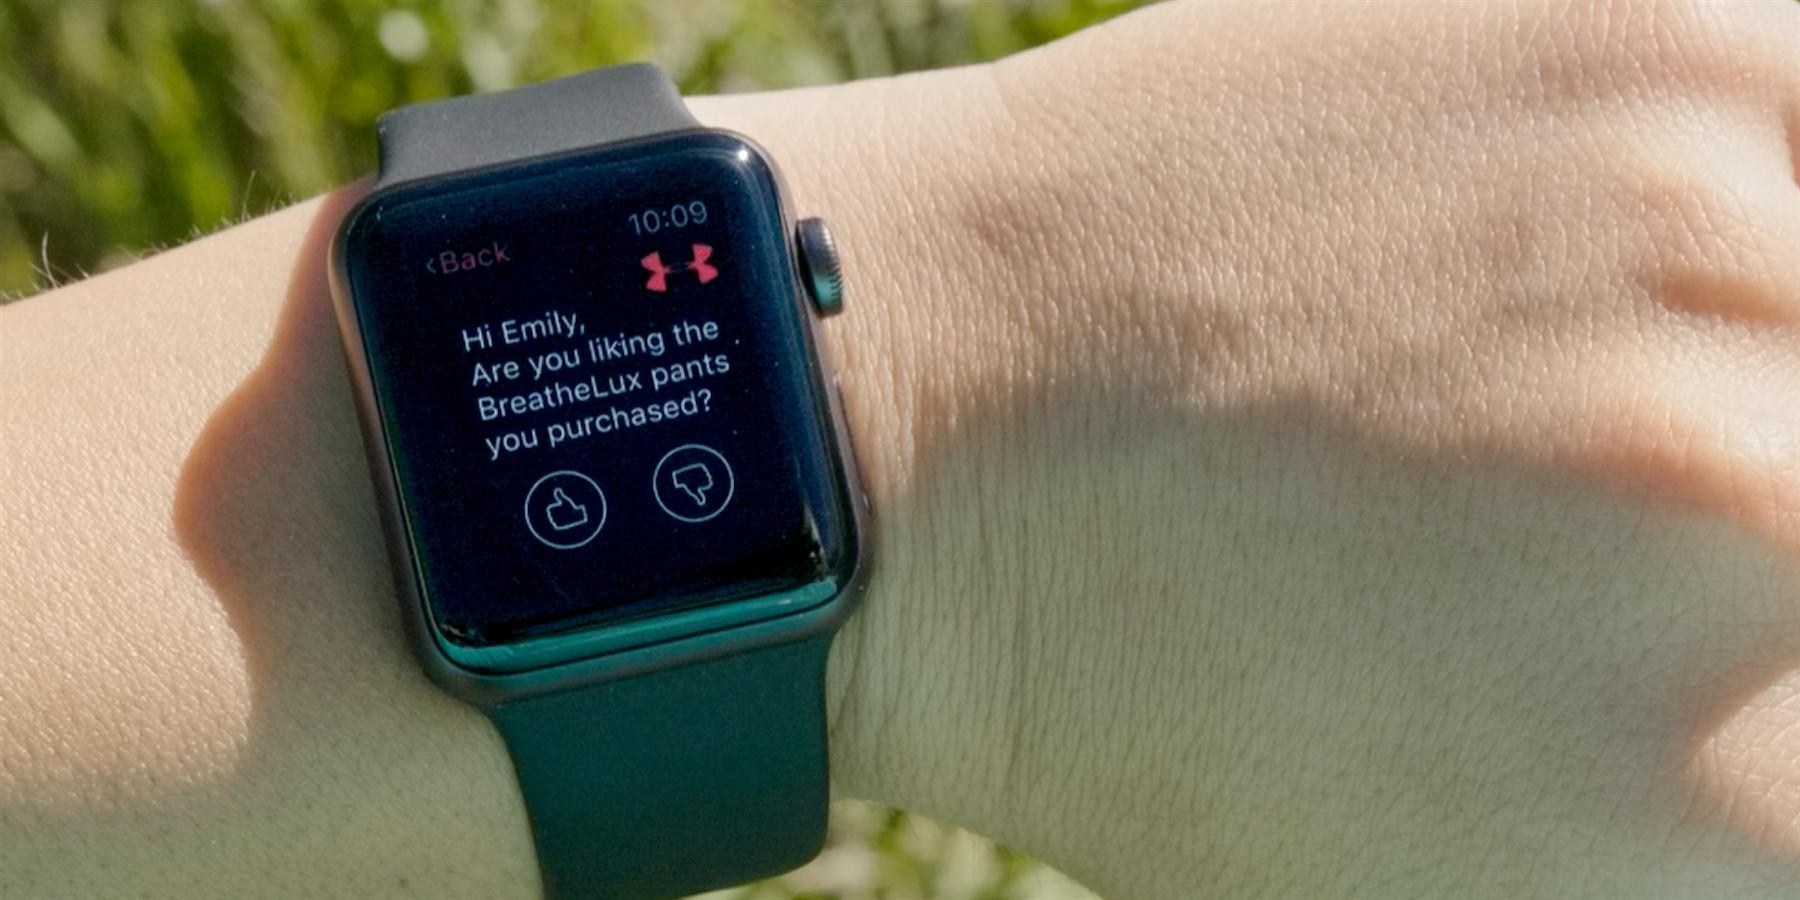 Apple Watch app asks user for feedback